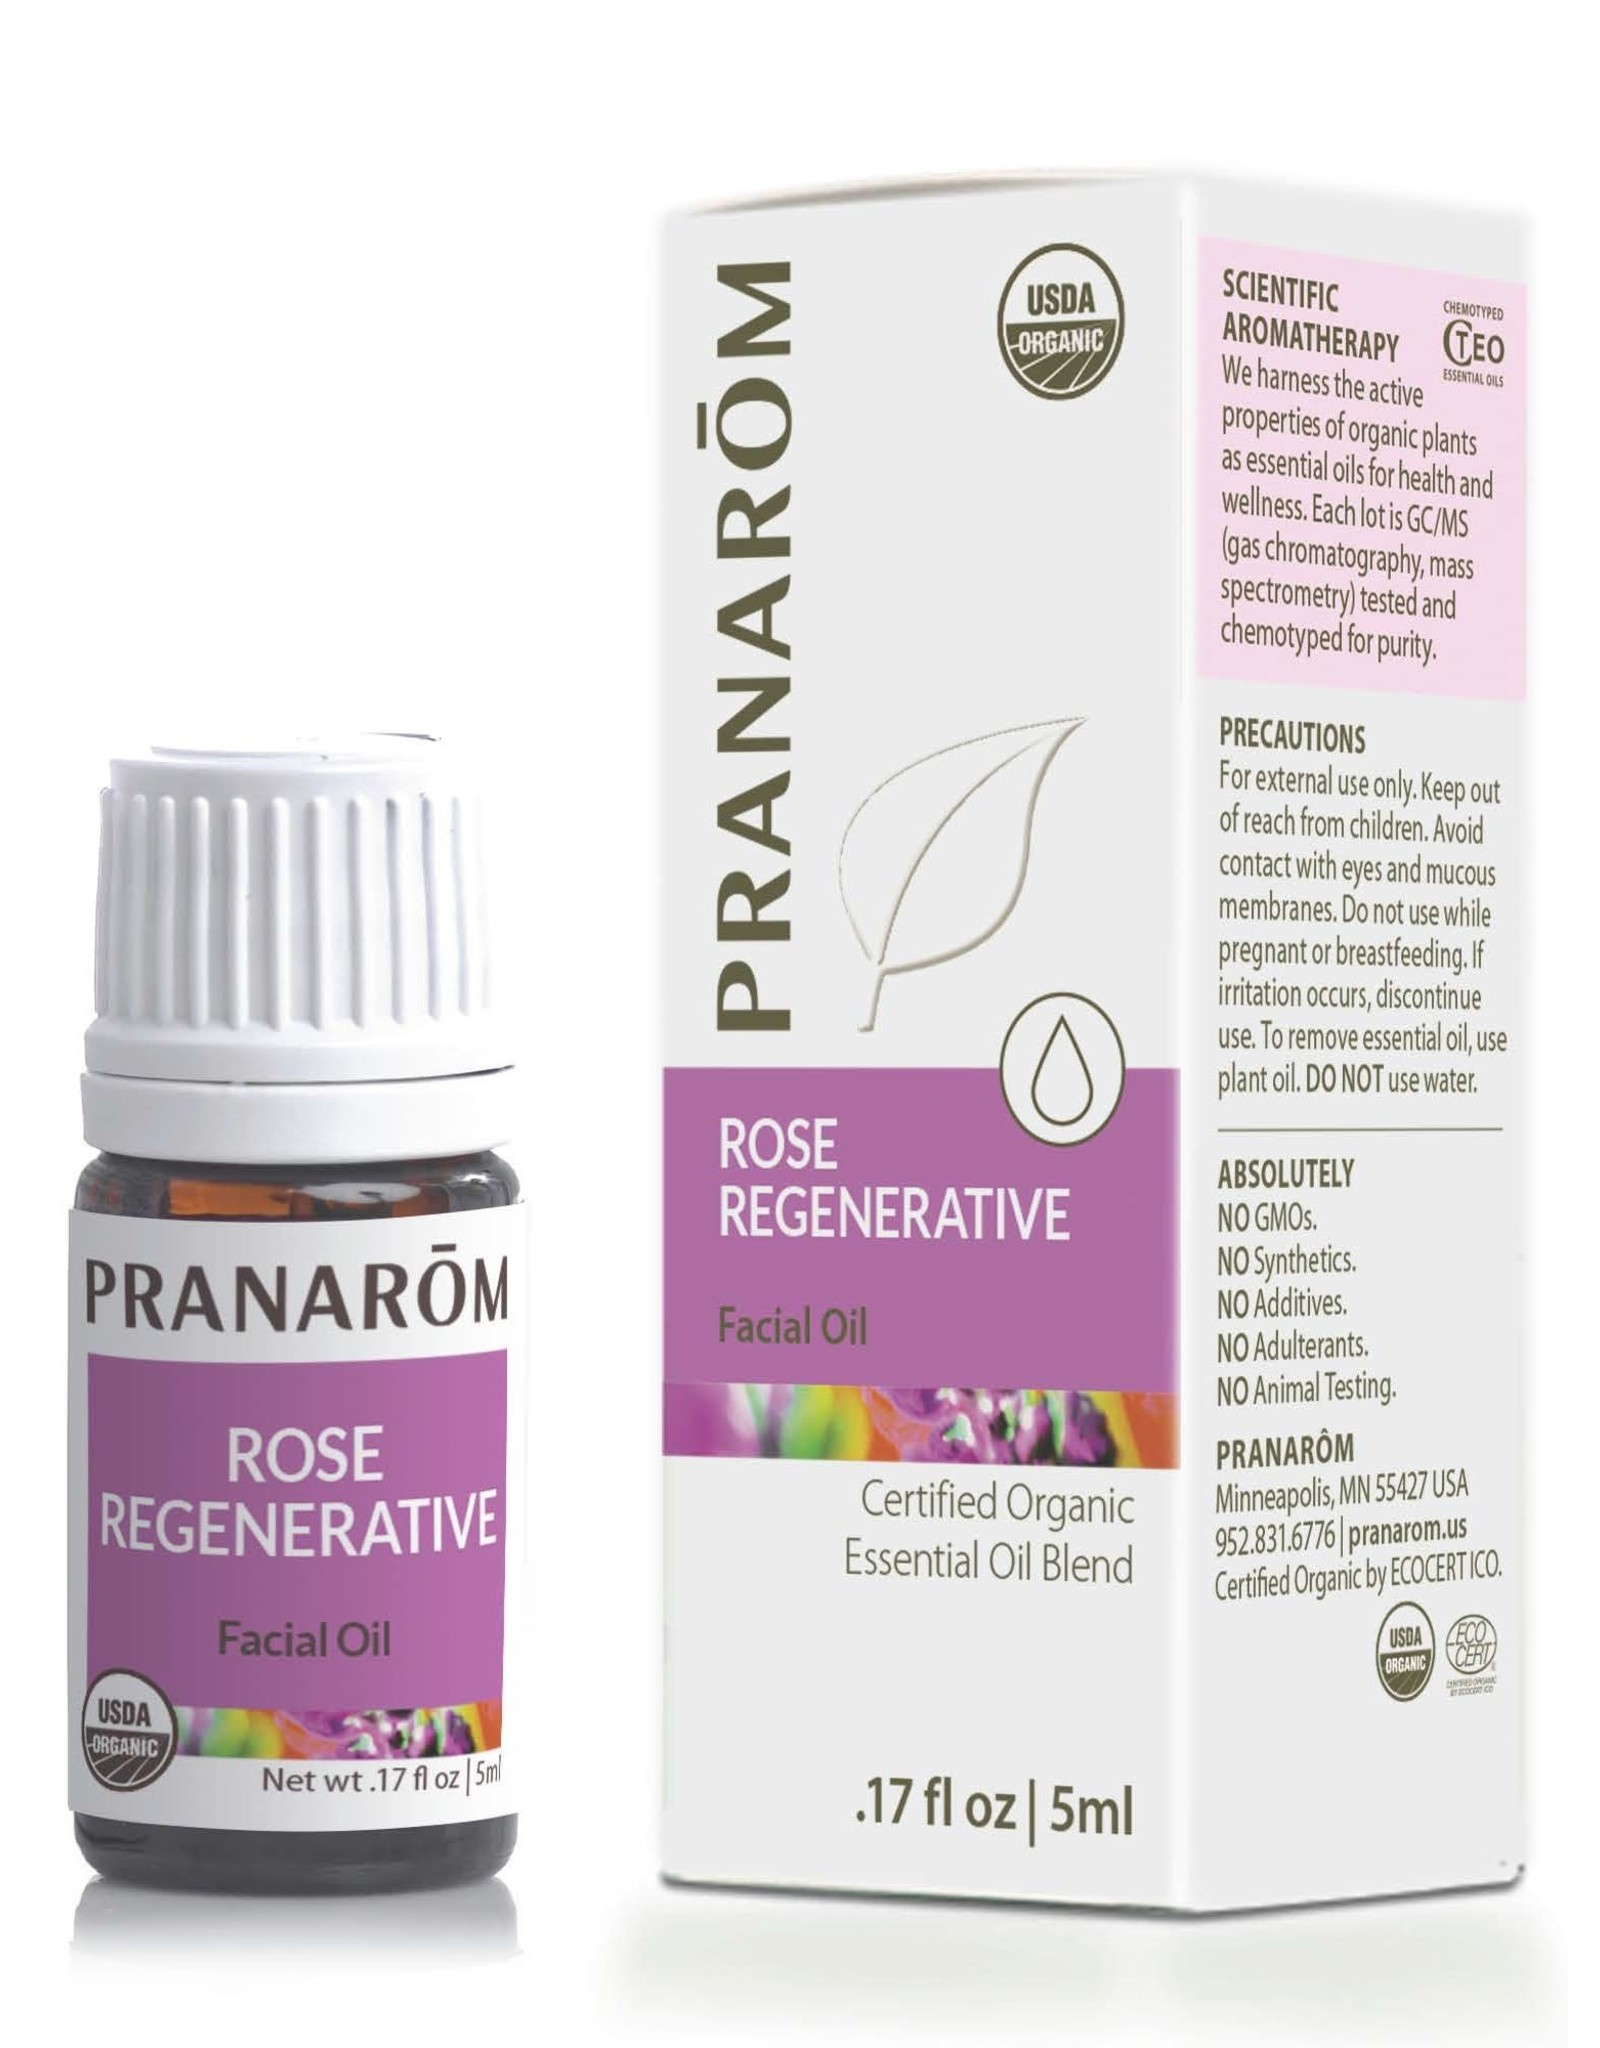 Rose Regenerative Facial Oil, 5ml